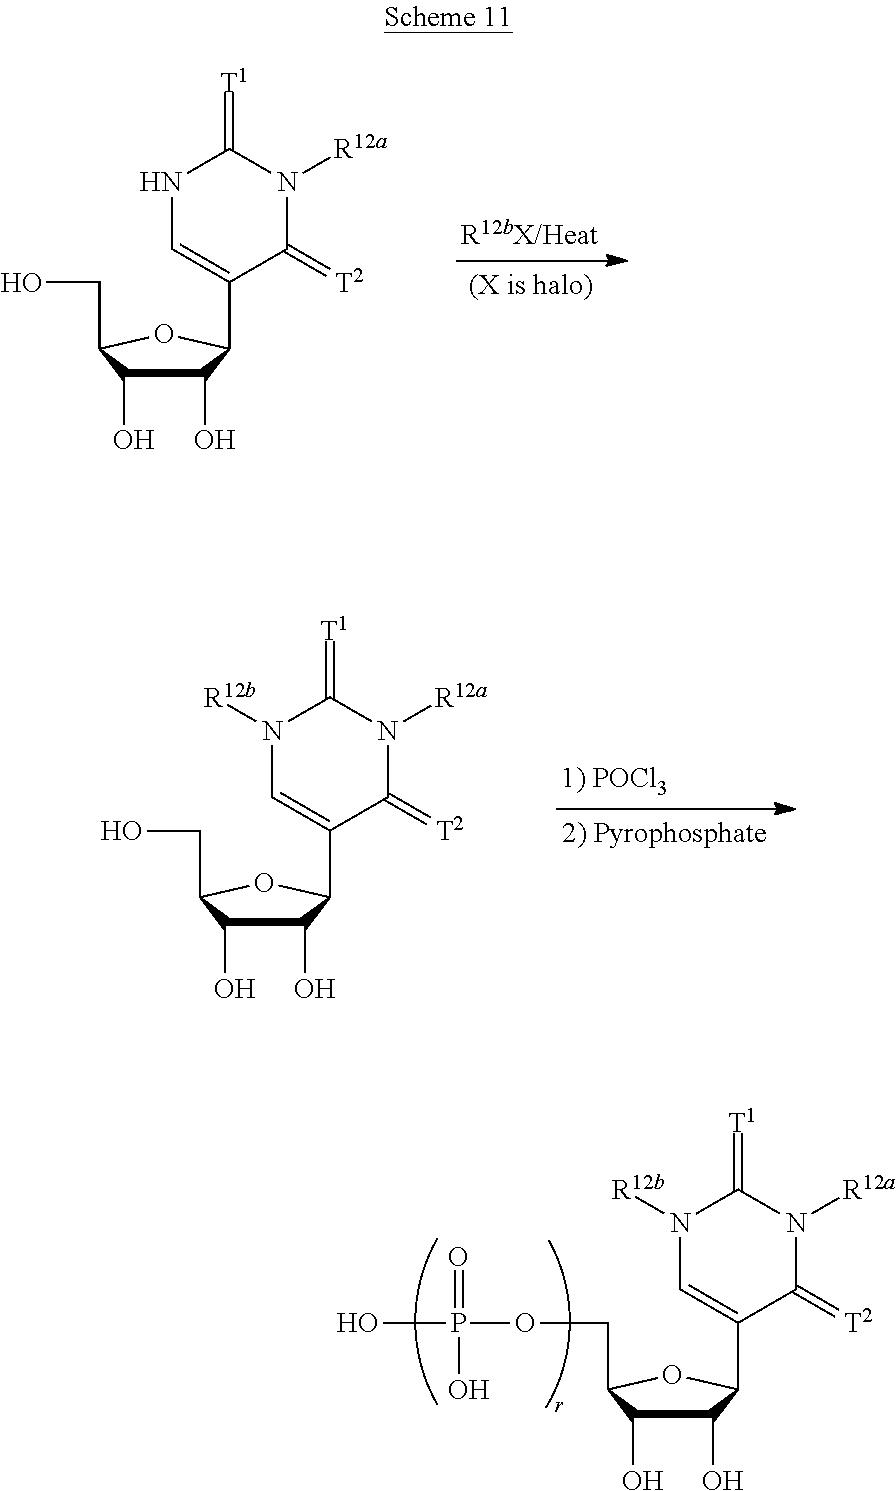 Patent US 9,283,287 B2